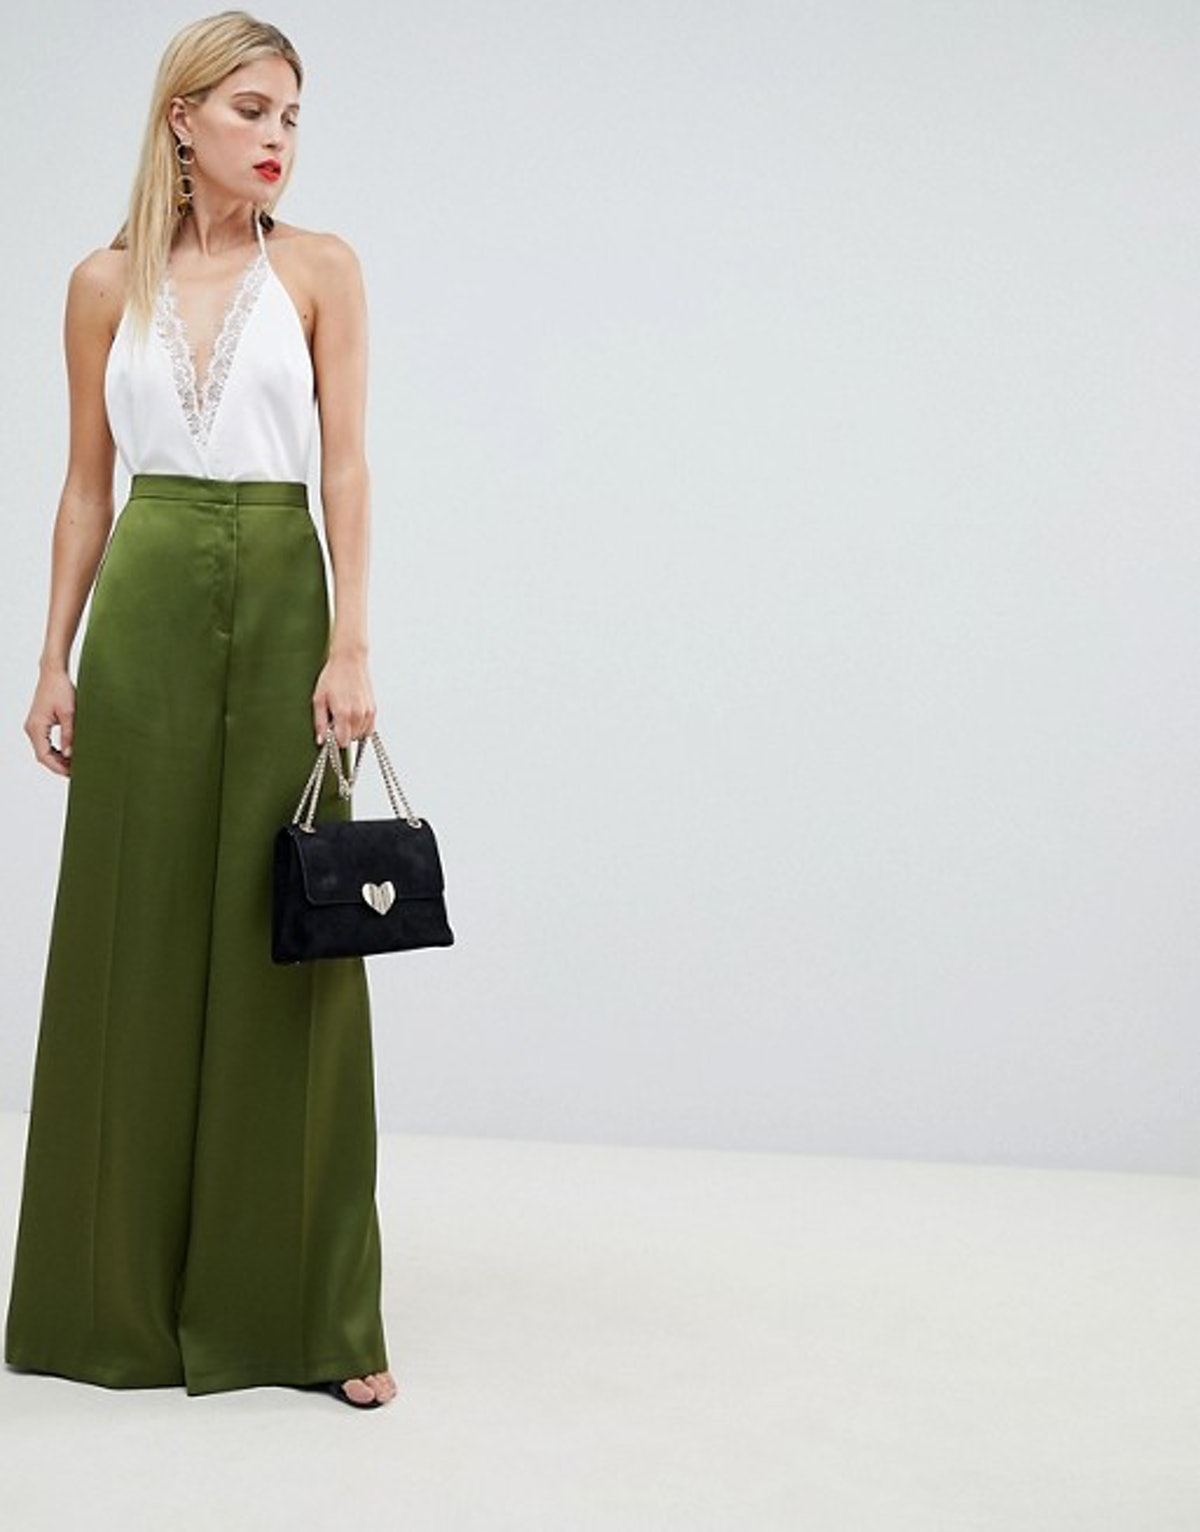 ASOS DESIGN Tailored Satin Wide Leg Pants